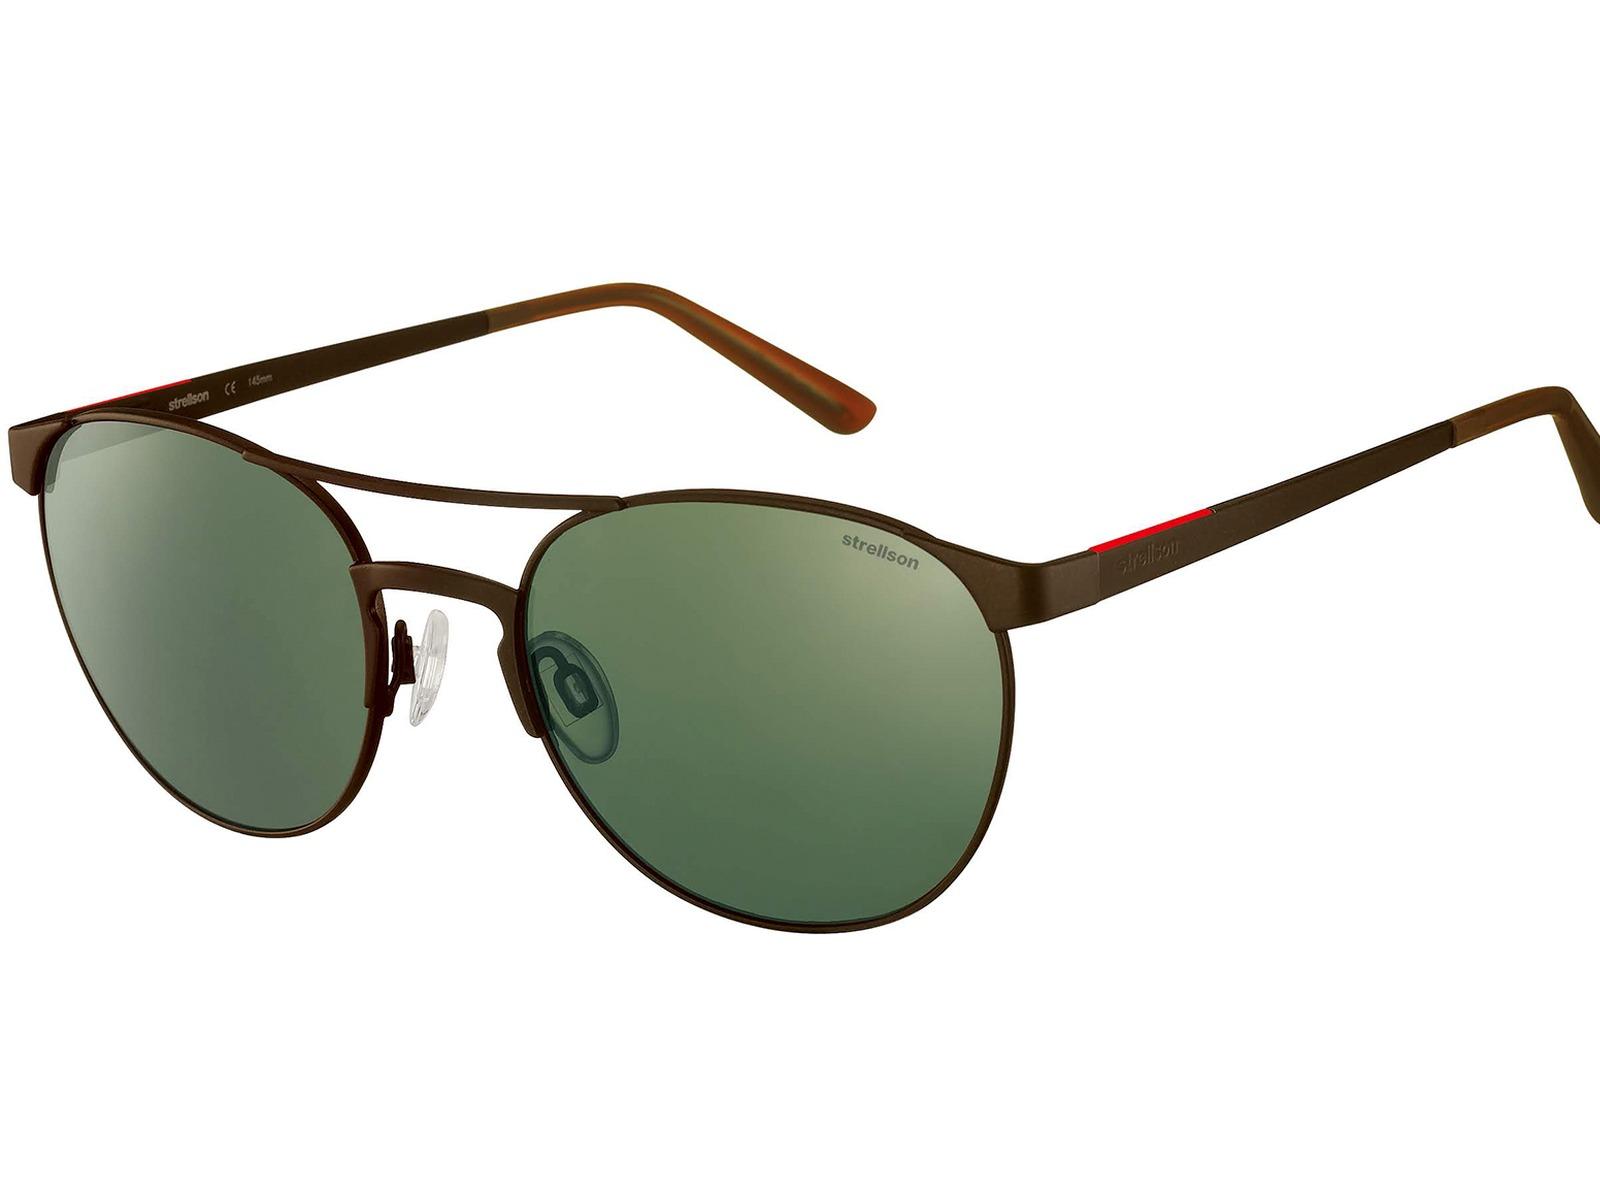 Zonnebril Lichte Glazen : Nieuwe strellson zonnebrillen u2022 nieuws de opticien